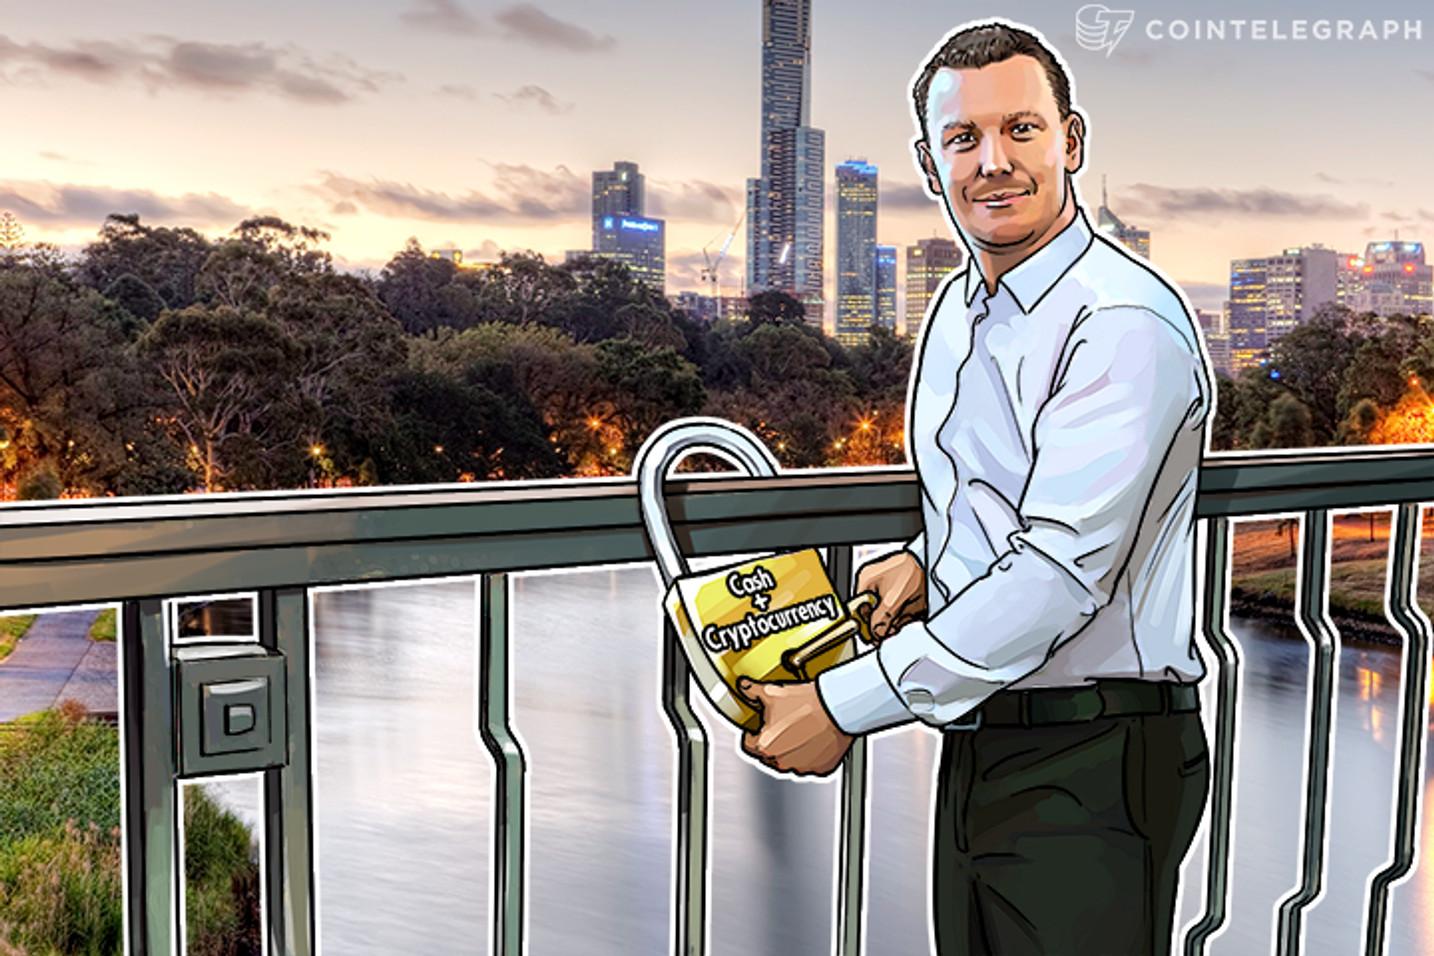 We Need to Bridge Cash and Cryptocurrencies - Diebold Inc